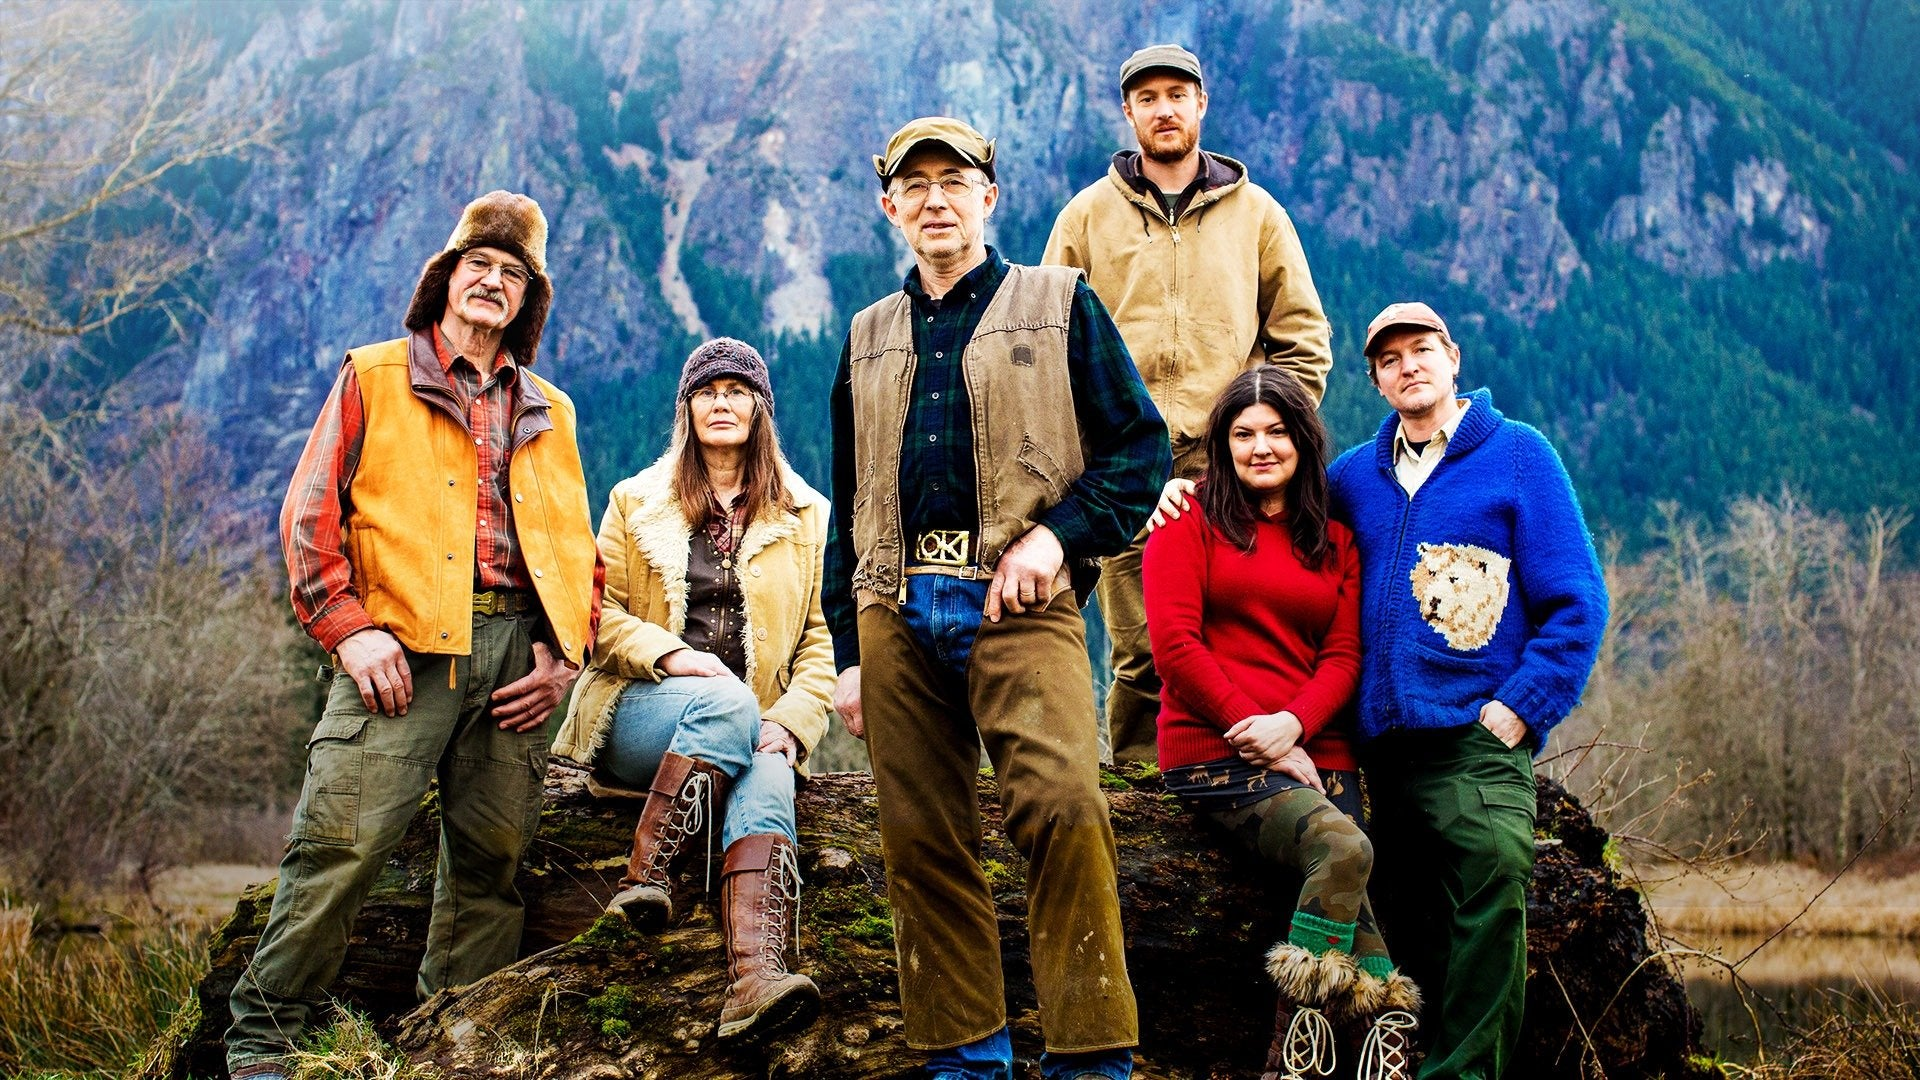 Alaska: The Last Frontier Exposed